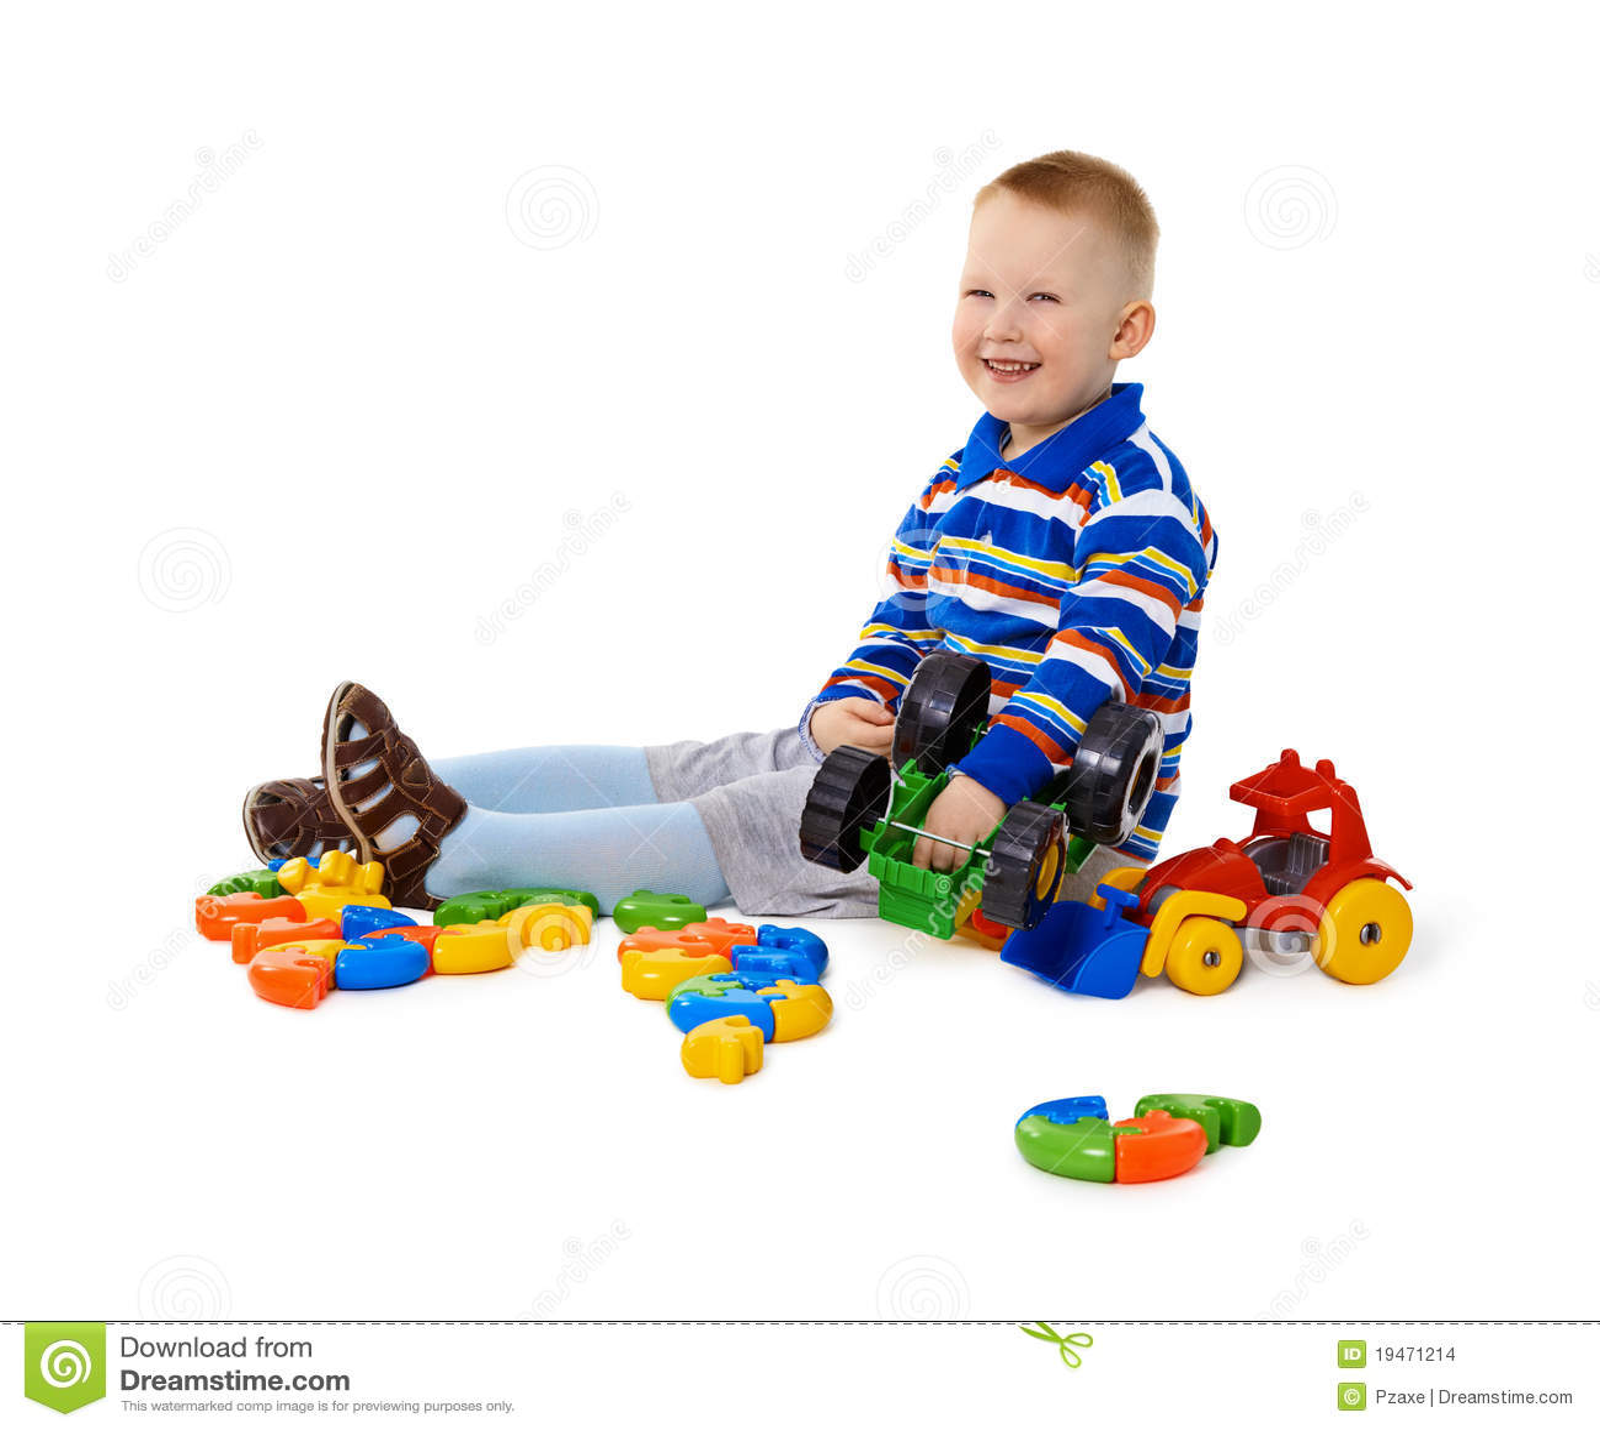 Little Boy Toys : Little boy sitting among toys on floor stock images